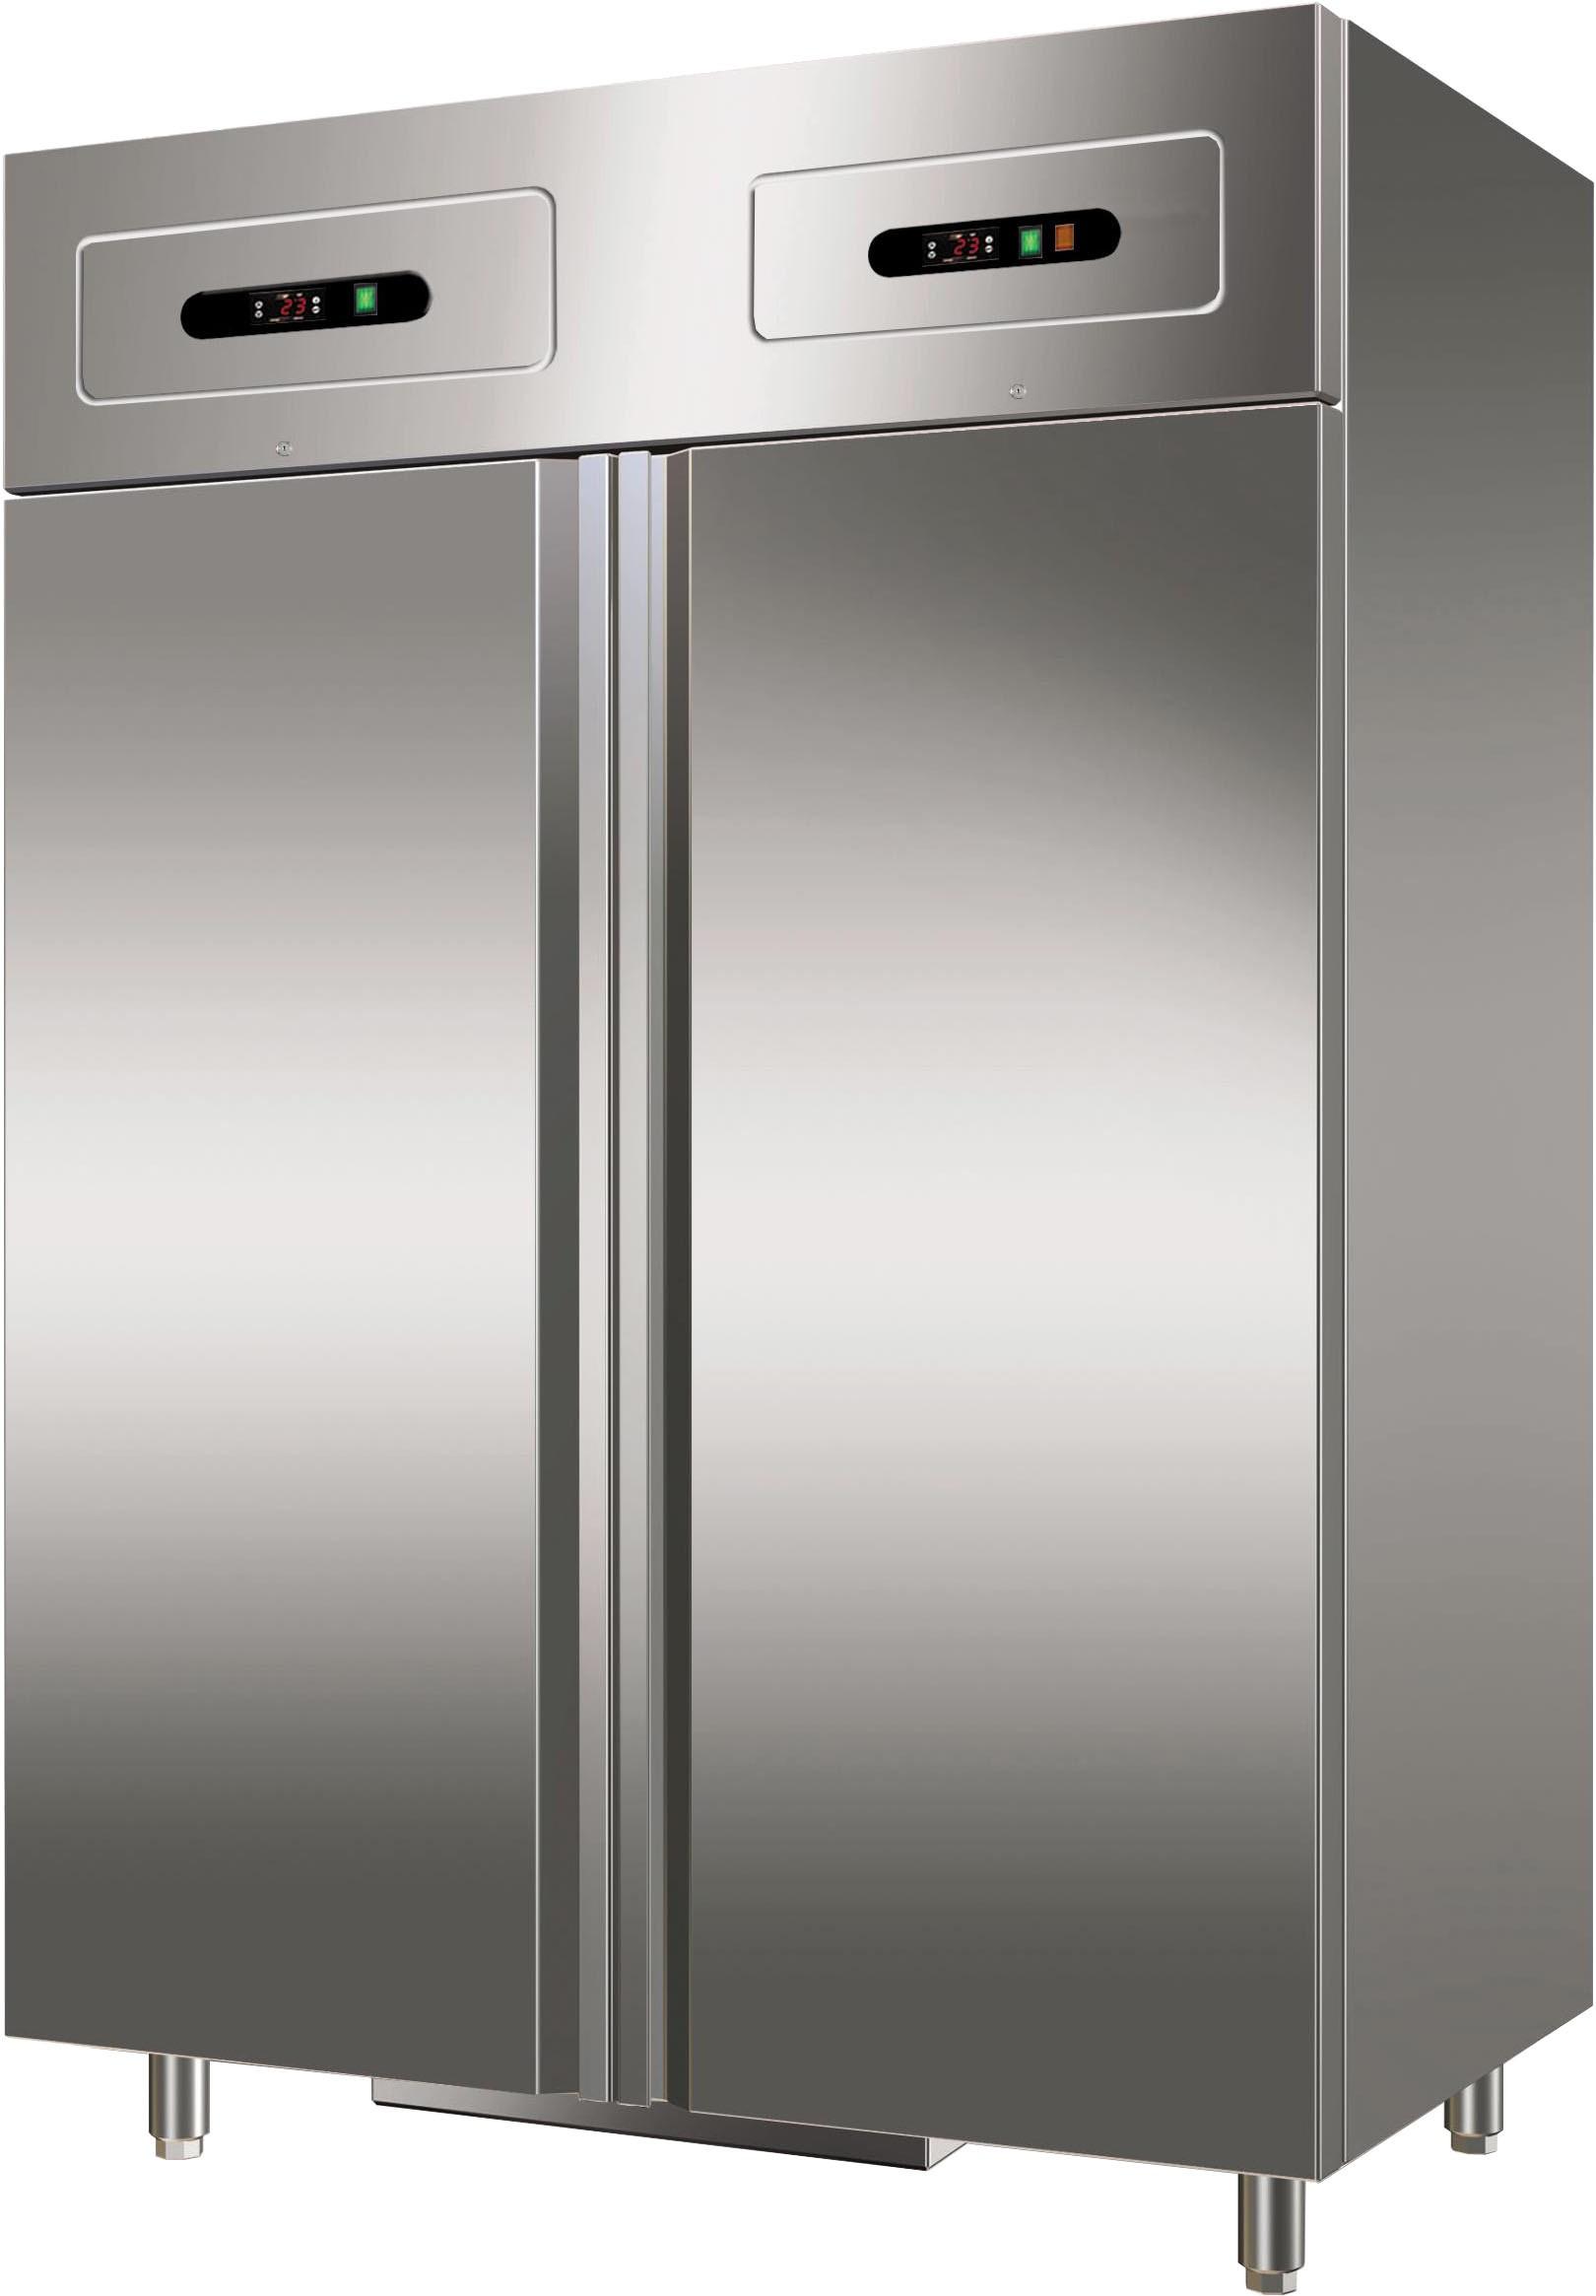 ugostiteljska oprema, profesionalni hladnjak, frižider, Forcar, GN 1410TN